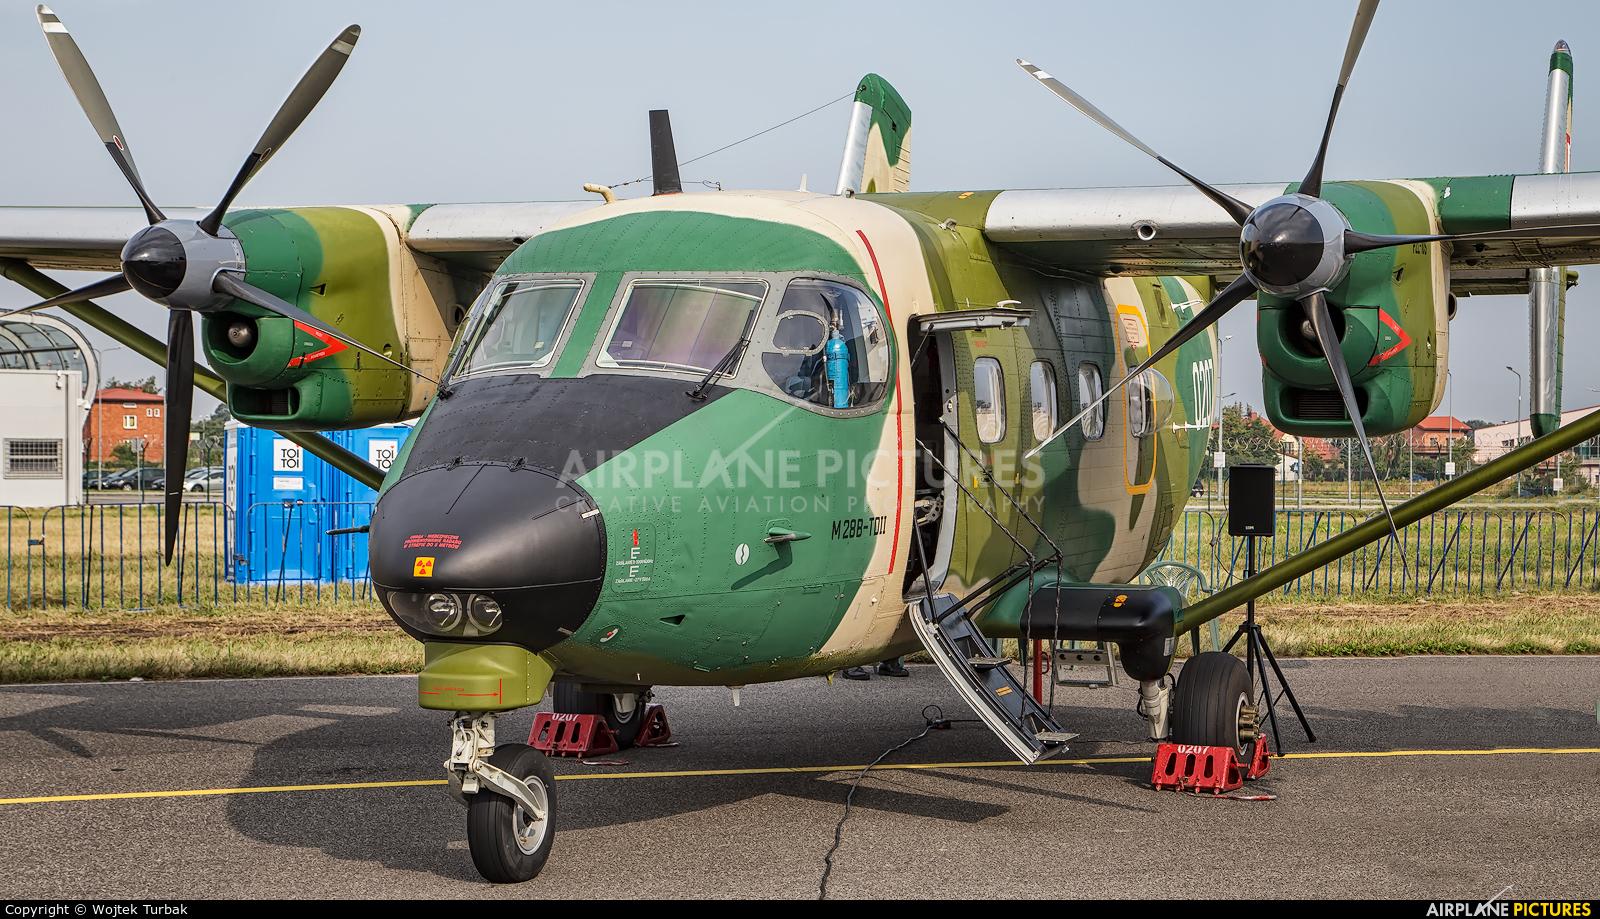 Poland - Air Force 0207 aircraft at Radom - Sadków